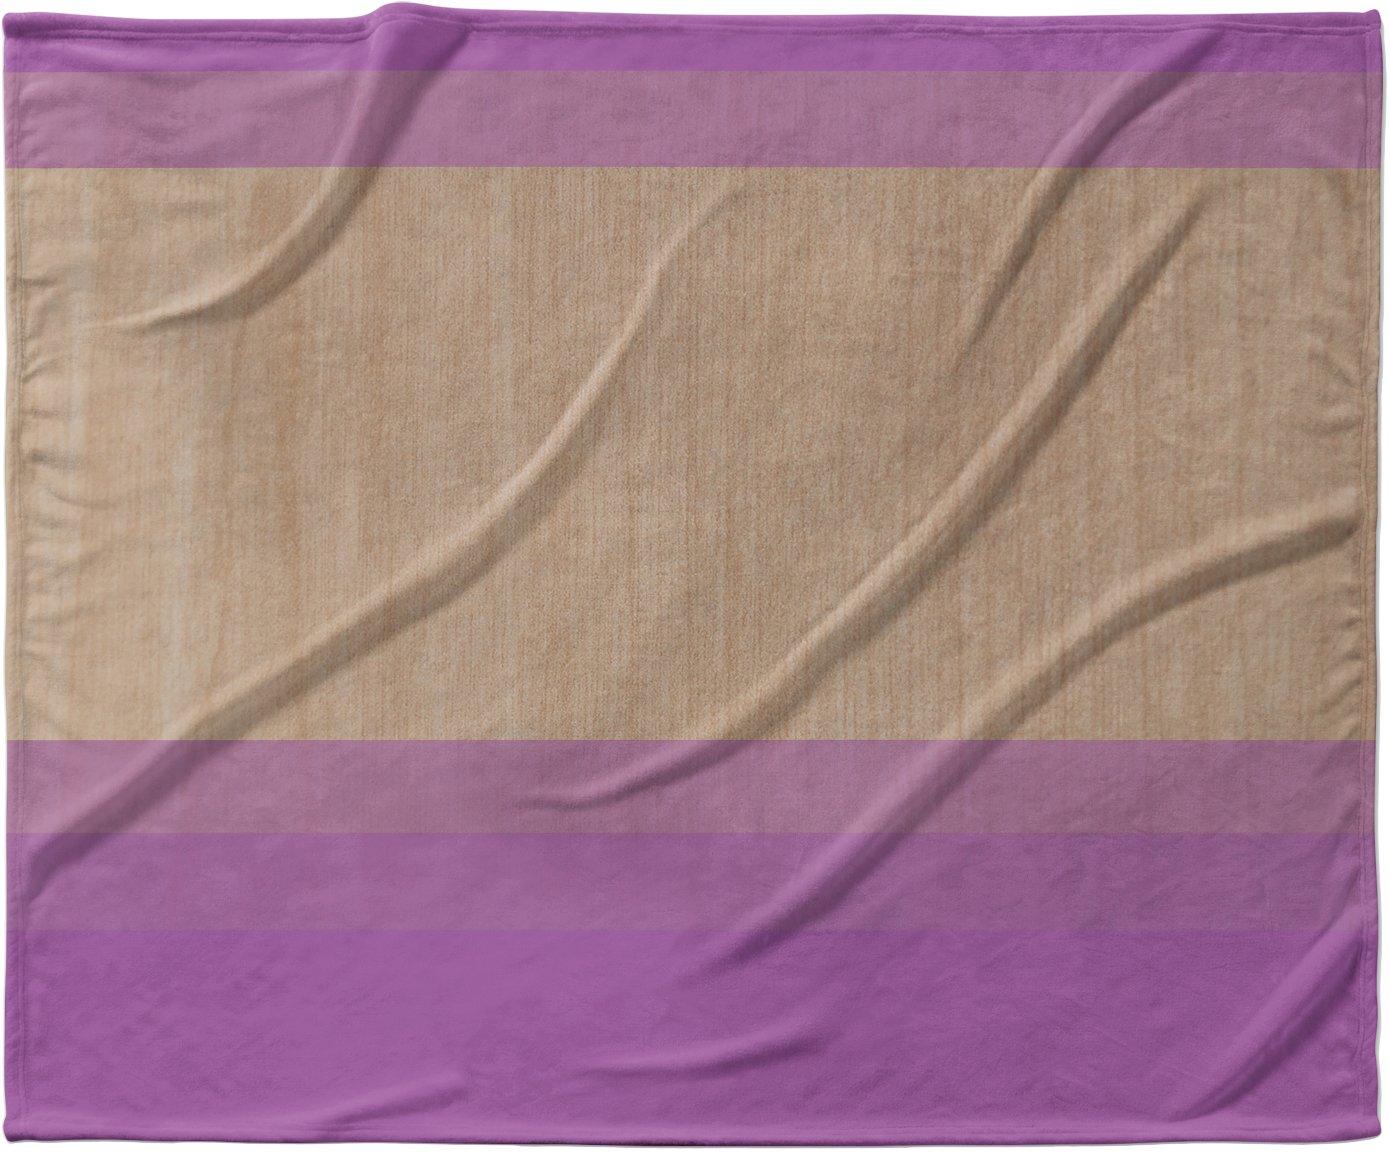 KESS InHouse Brittany Guarino ''Art Purple'' Lavender Wood Fleece Baby Blanket, 40'' x 30''